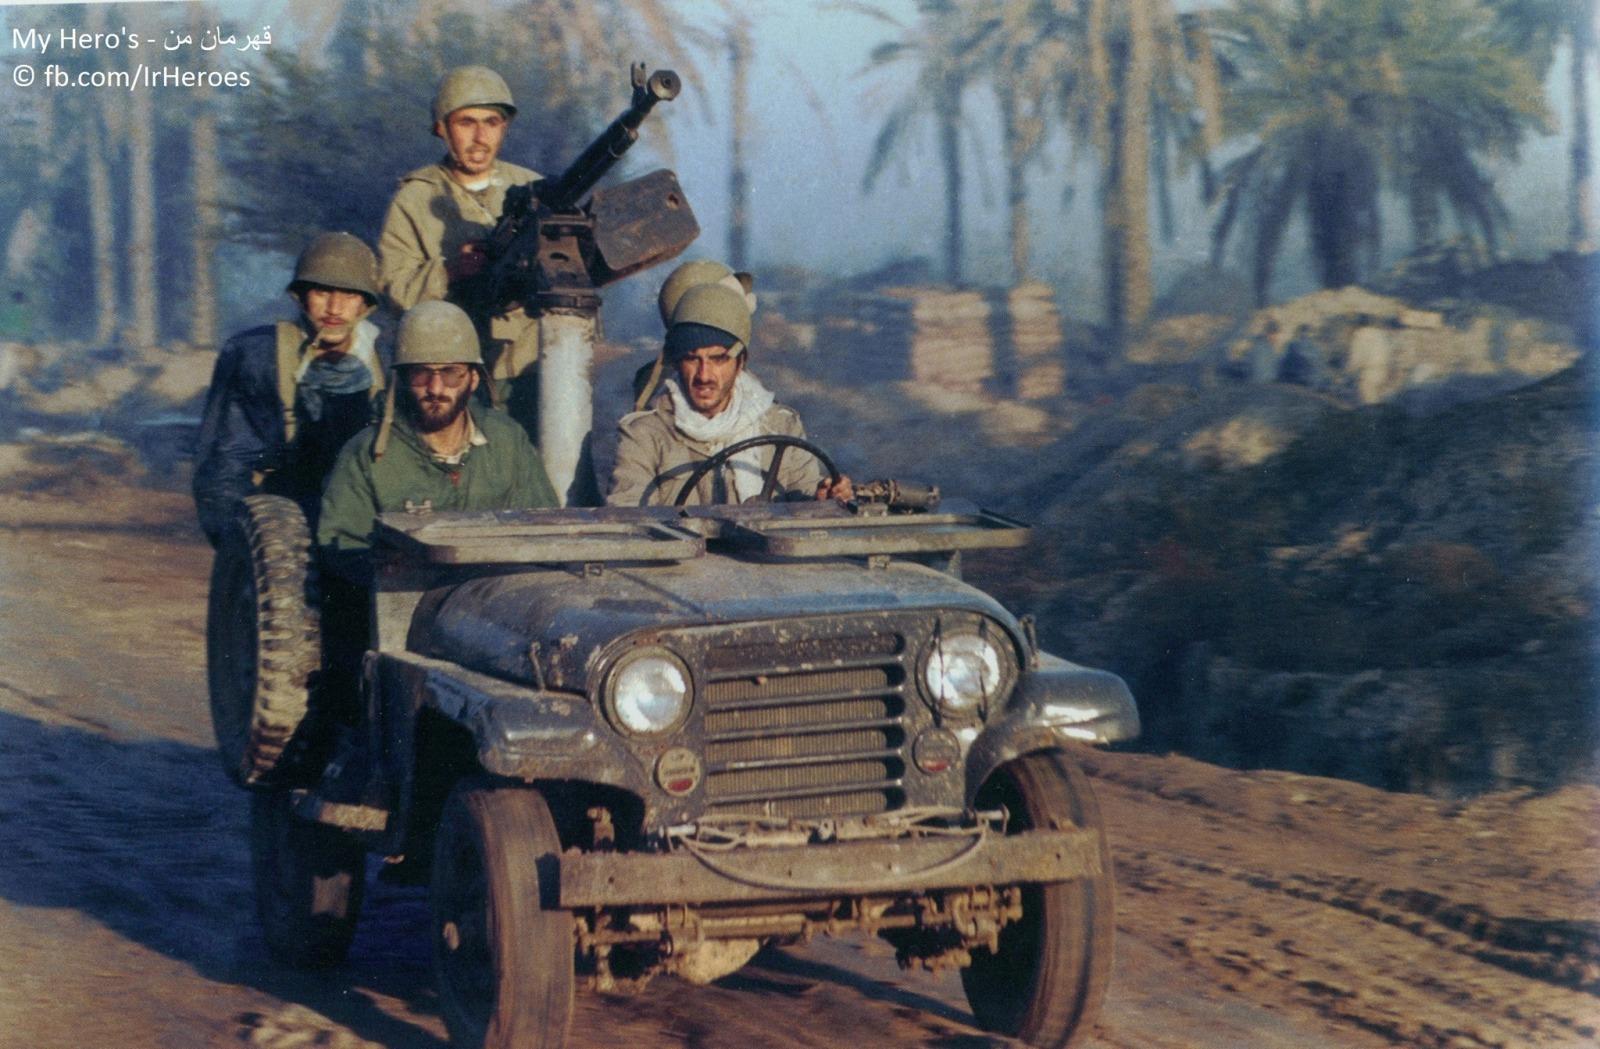 İran - Irak Savaşı 1980 6